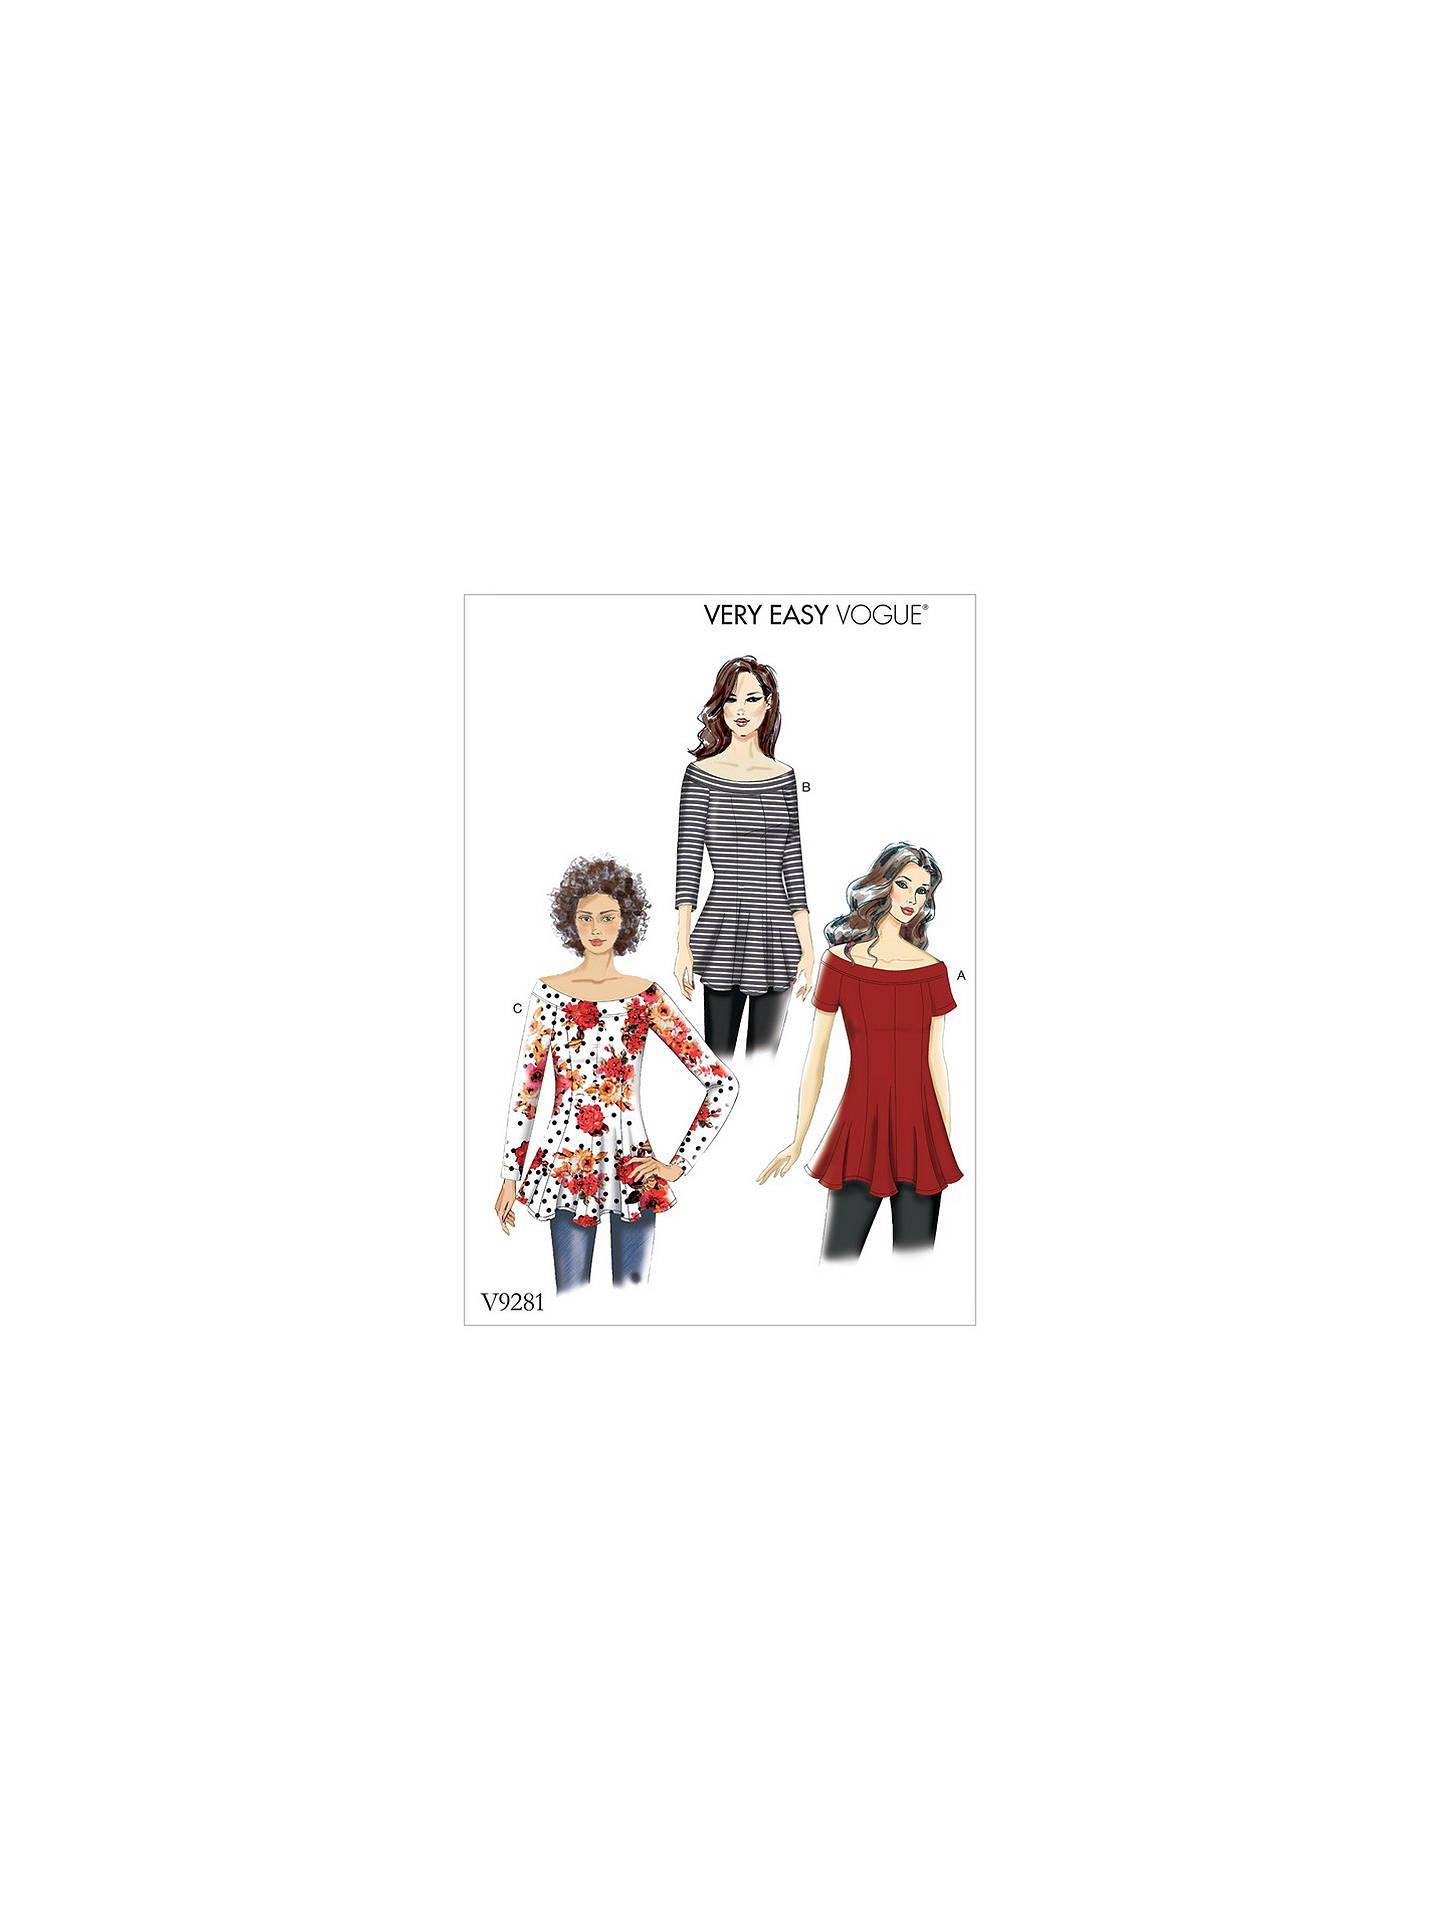 58629ba35e0da2 Buy Vogue Women's Off Shoulder Tops Sewing Pattern, 9281, E5 Online at  johnlewis.